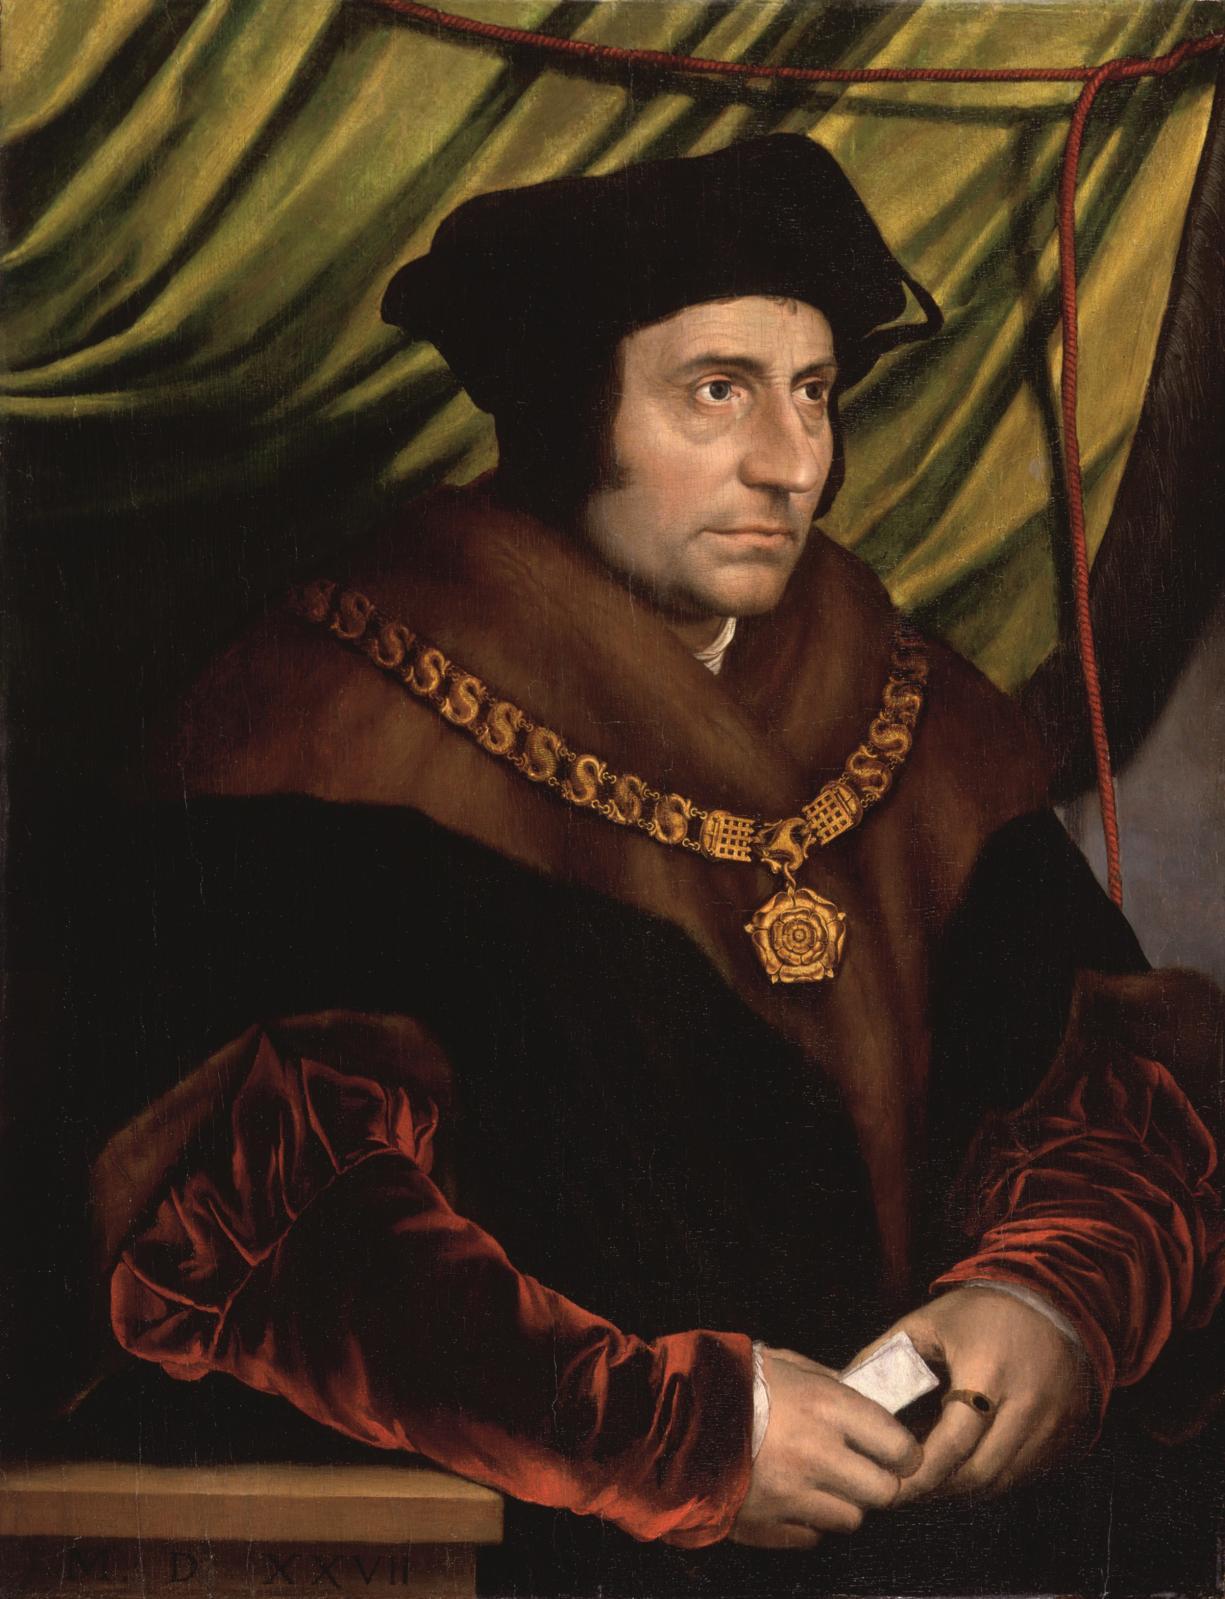 Portrait de sir Thomas More, Hans Holbein leJeune, vers 1527, Londres. ©National Gallery